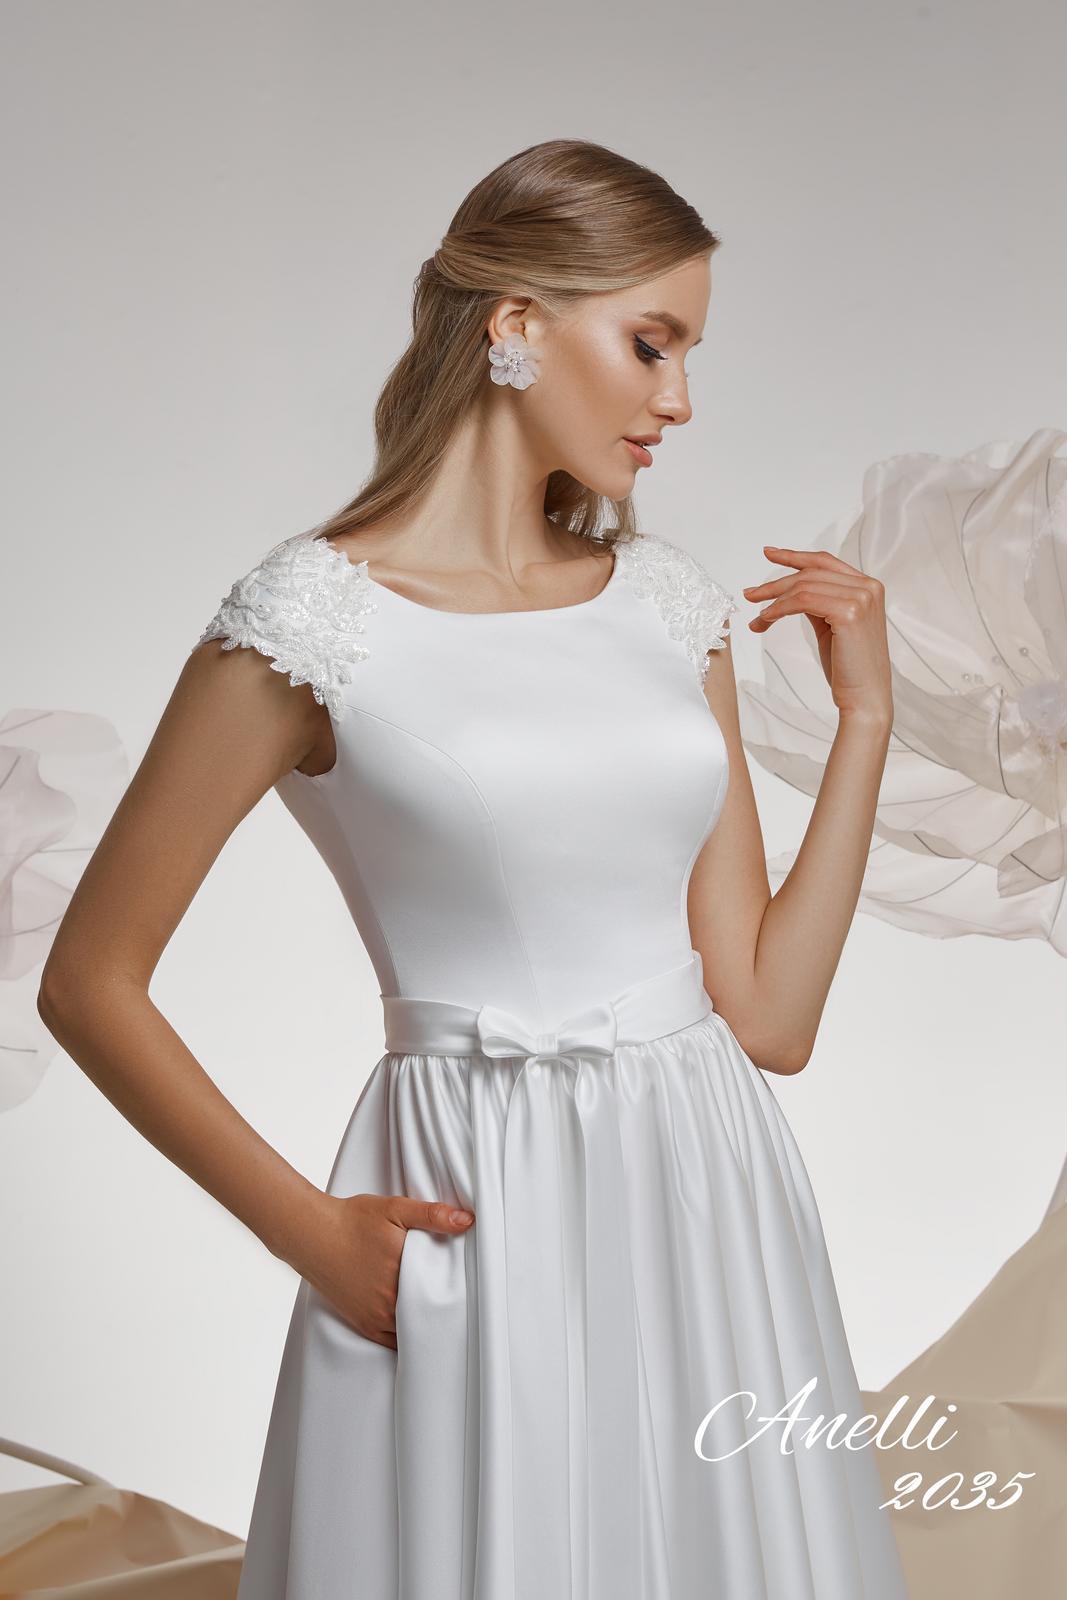 Svadobné šaty - Imagine 2035 - Obrázok č. 2